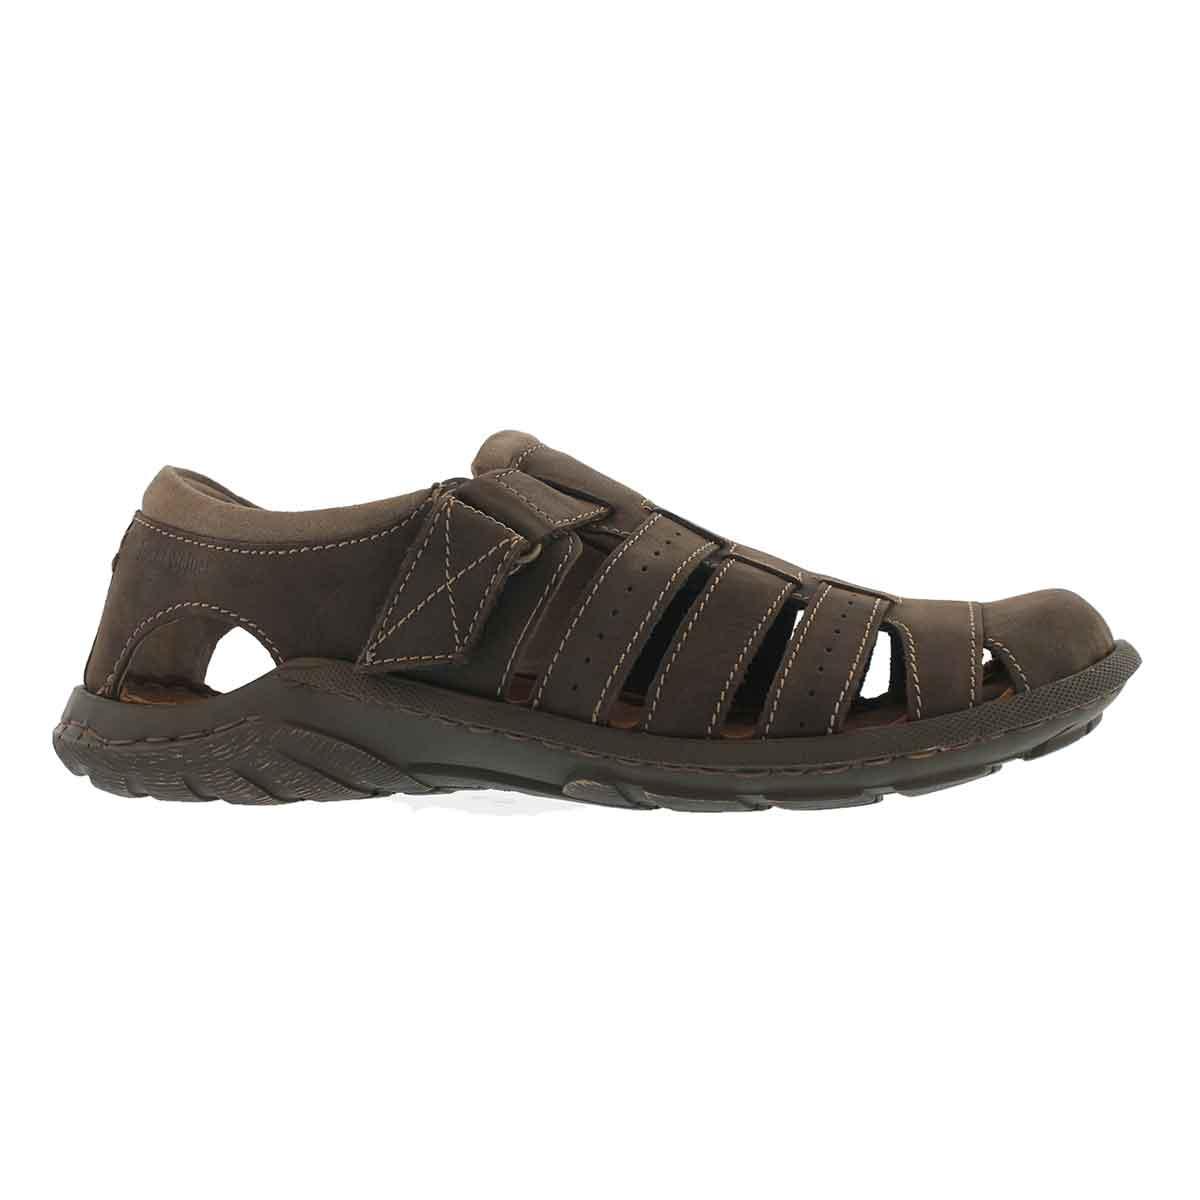 Mns Logan 36 moro casual sandal